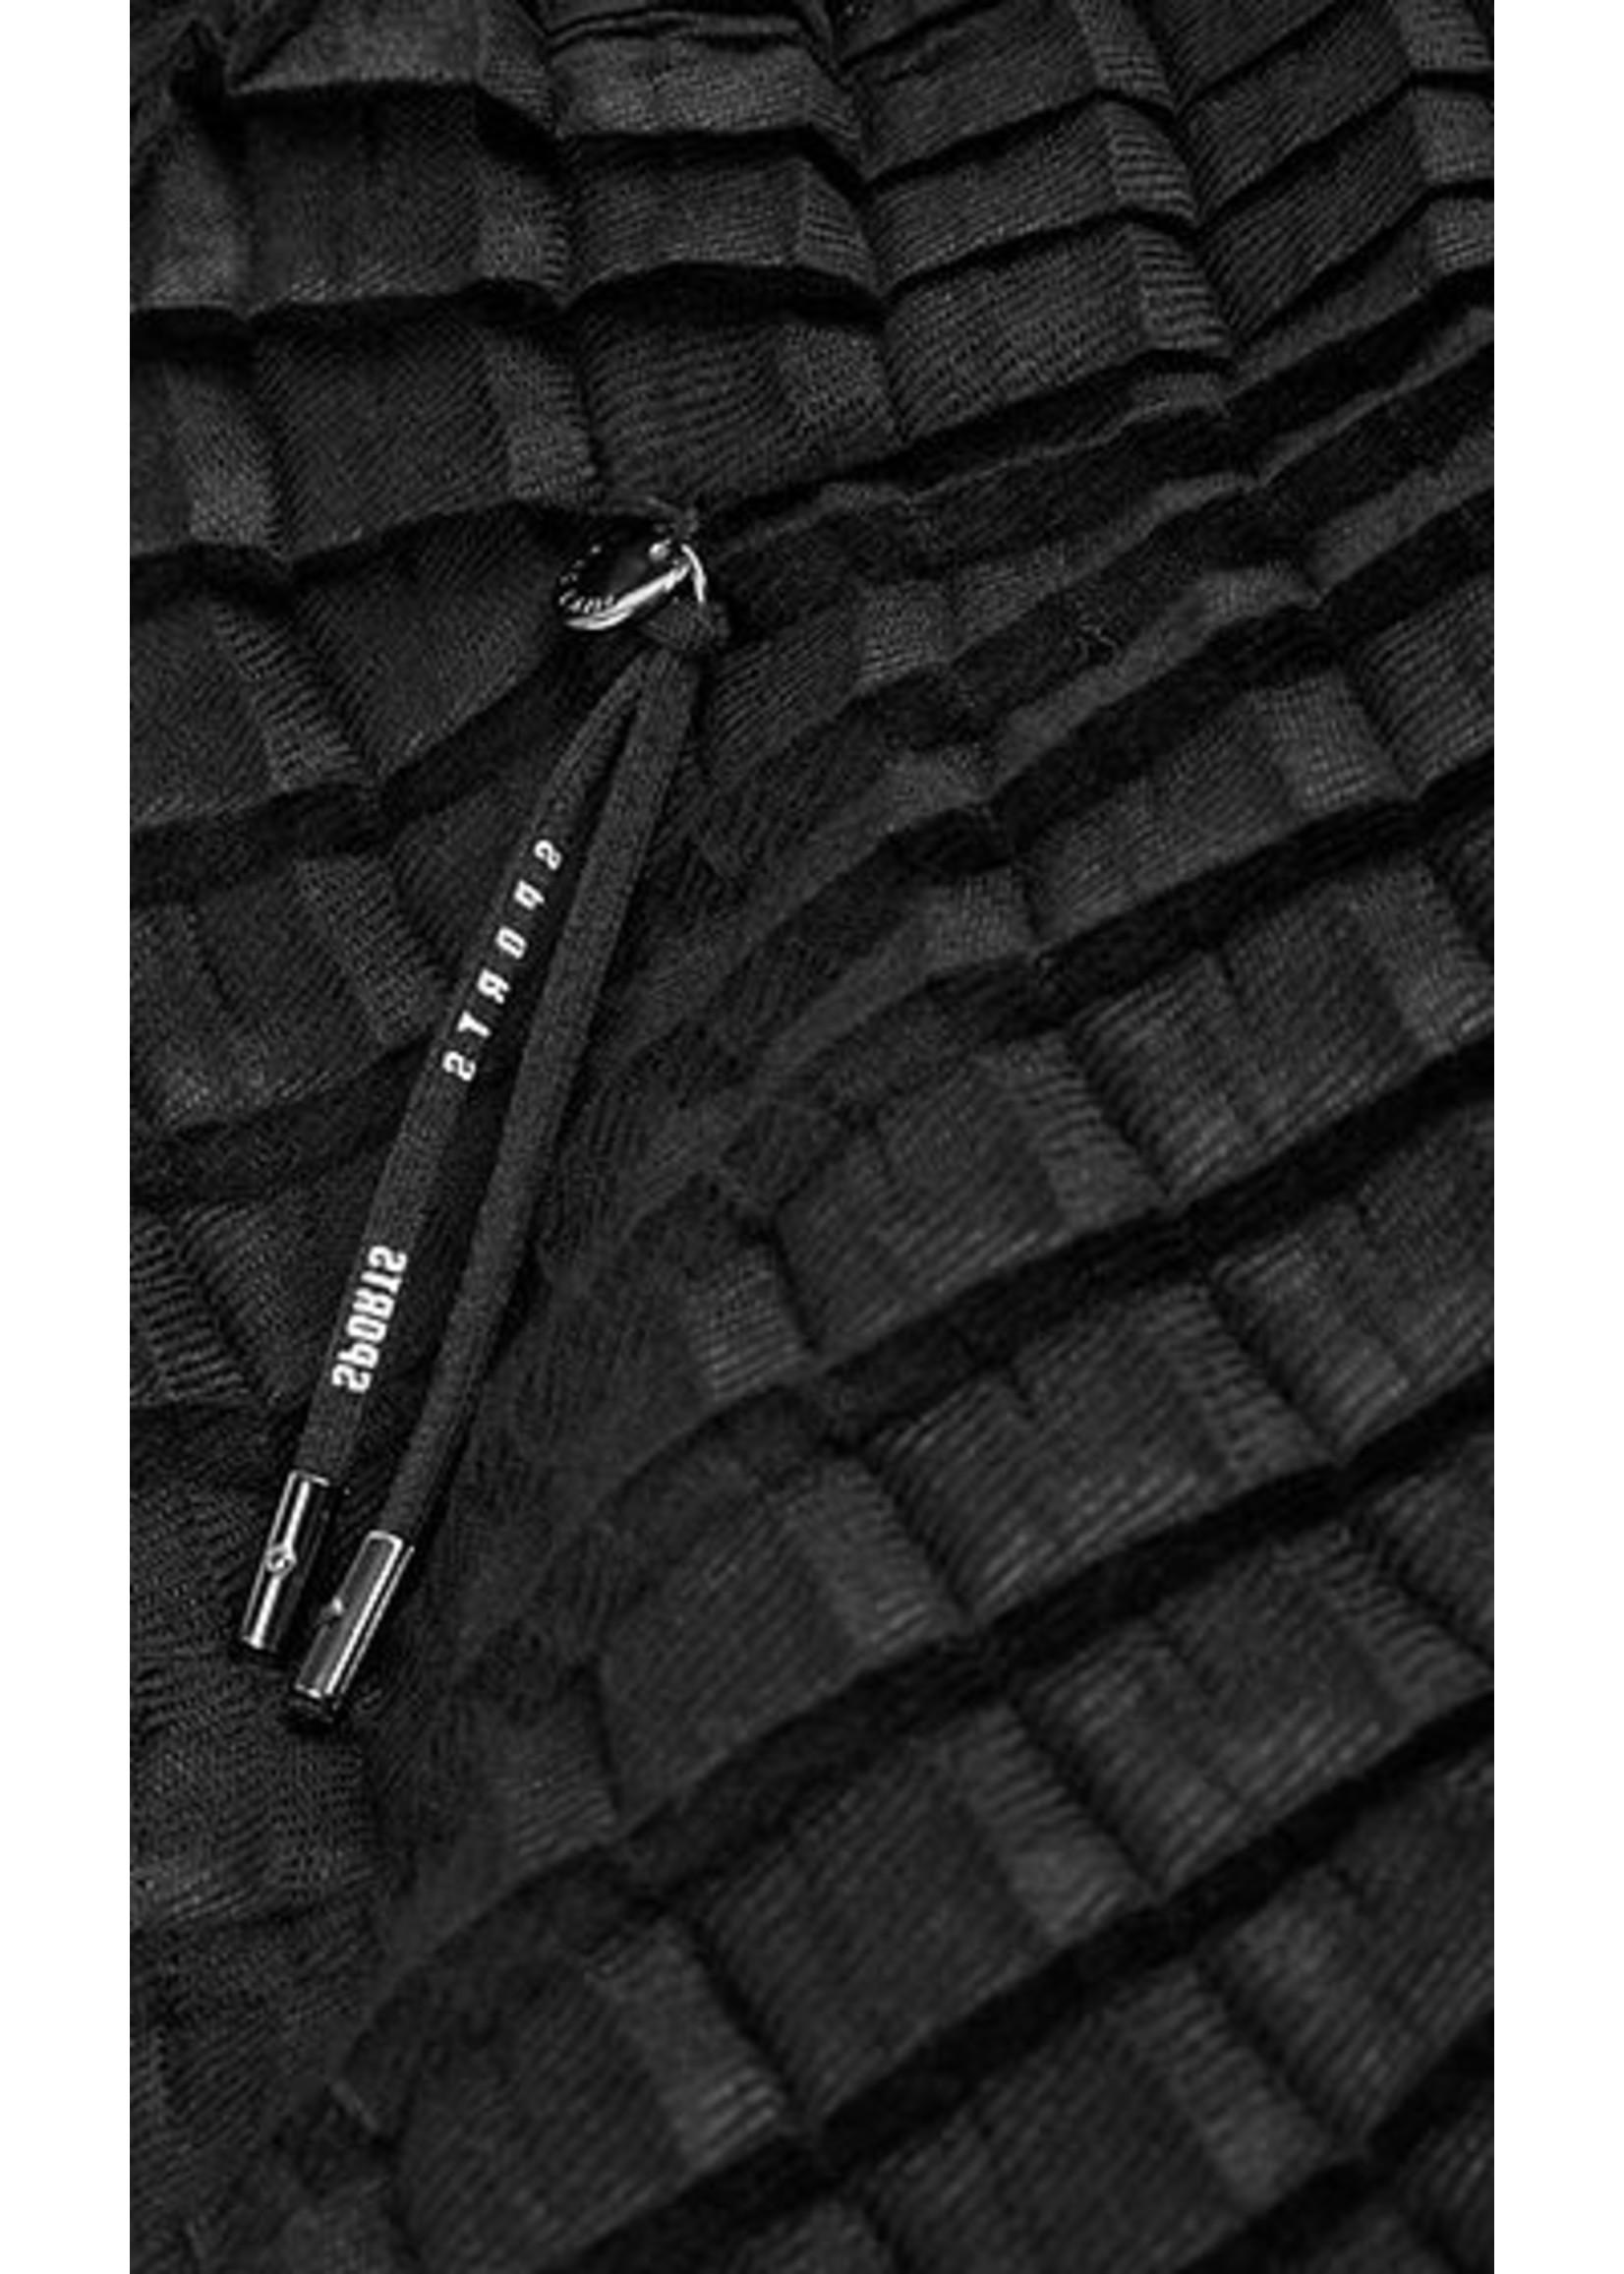 Marccain Sports Sjaal RS B4.02 Z14 black